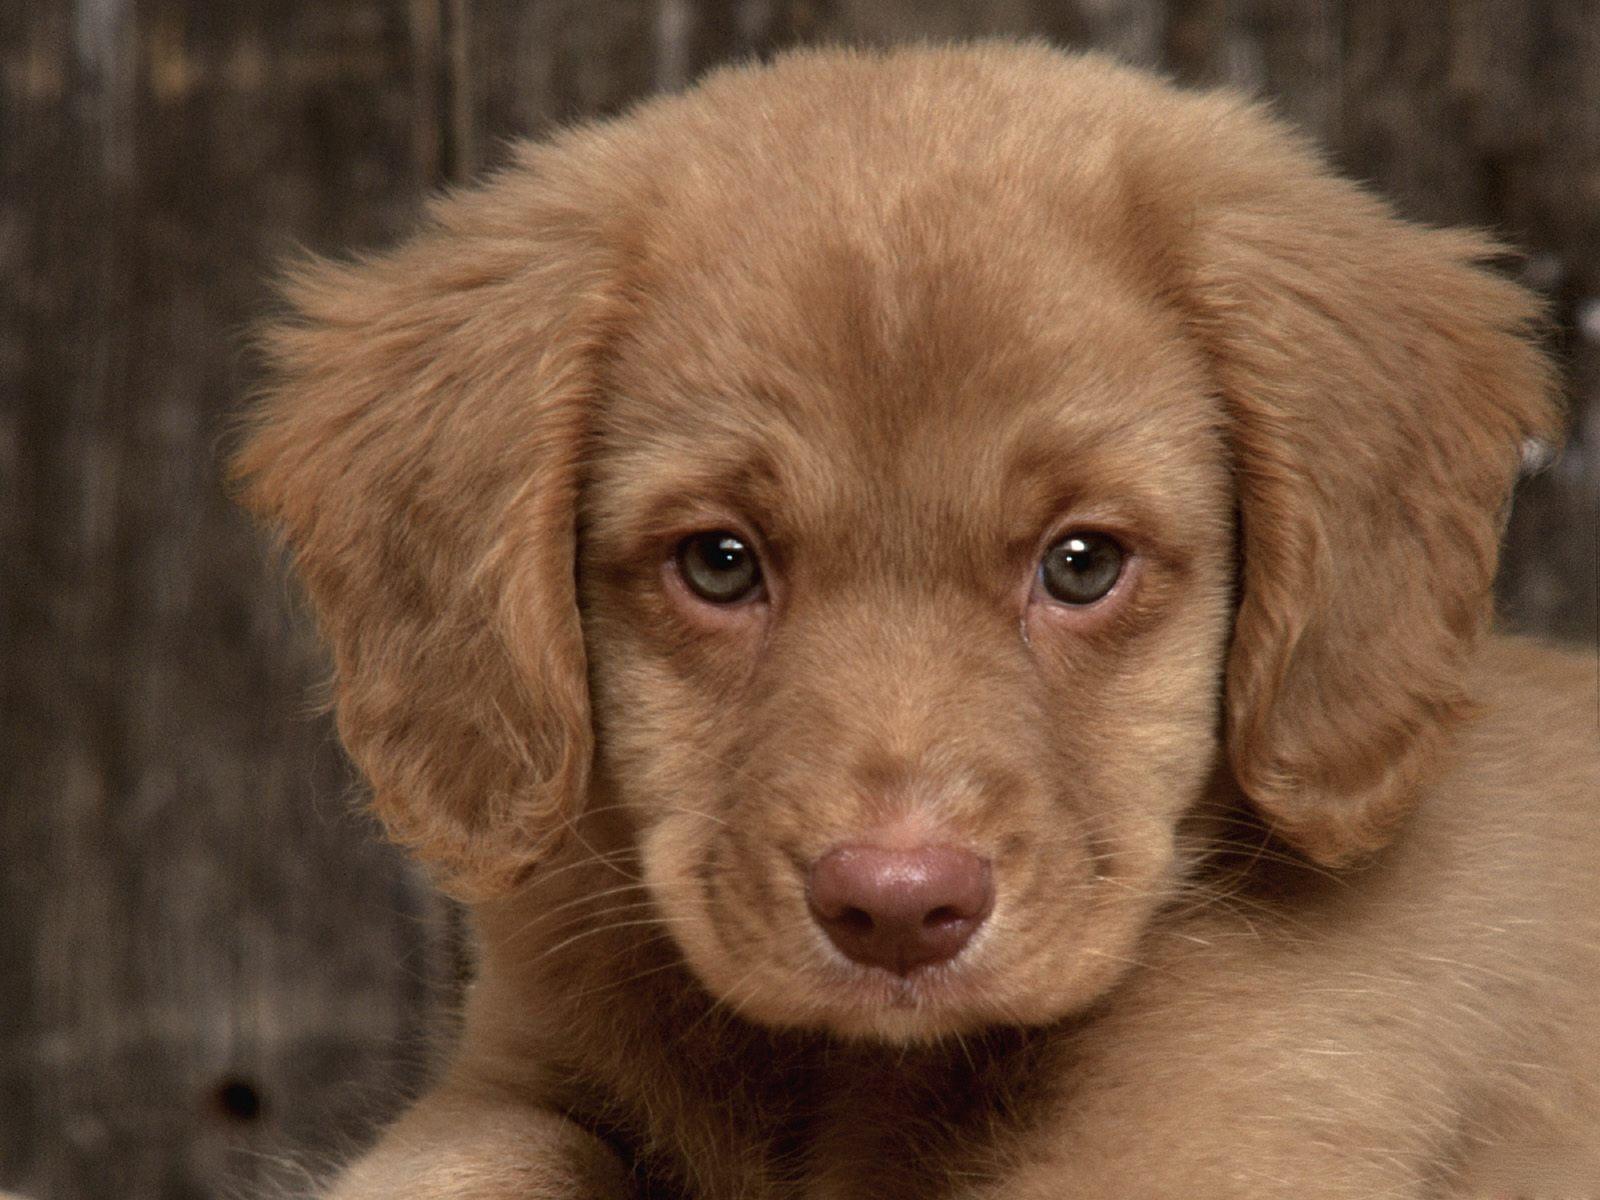 http://2.bp.blogspot.com/-3MUbNQoF19I/UJXoNeifbNI/AAAAAAAASD4/K_yaazR0RAU/s1600/cachorritos+(8).jpg